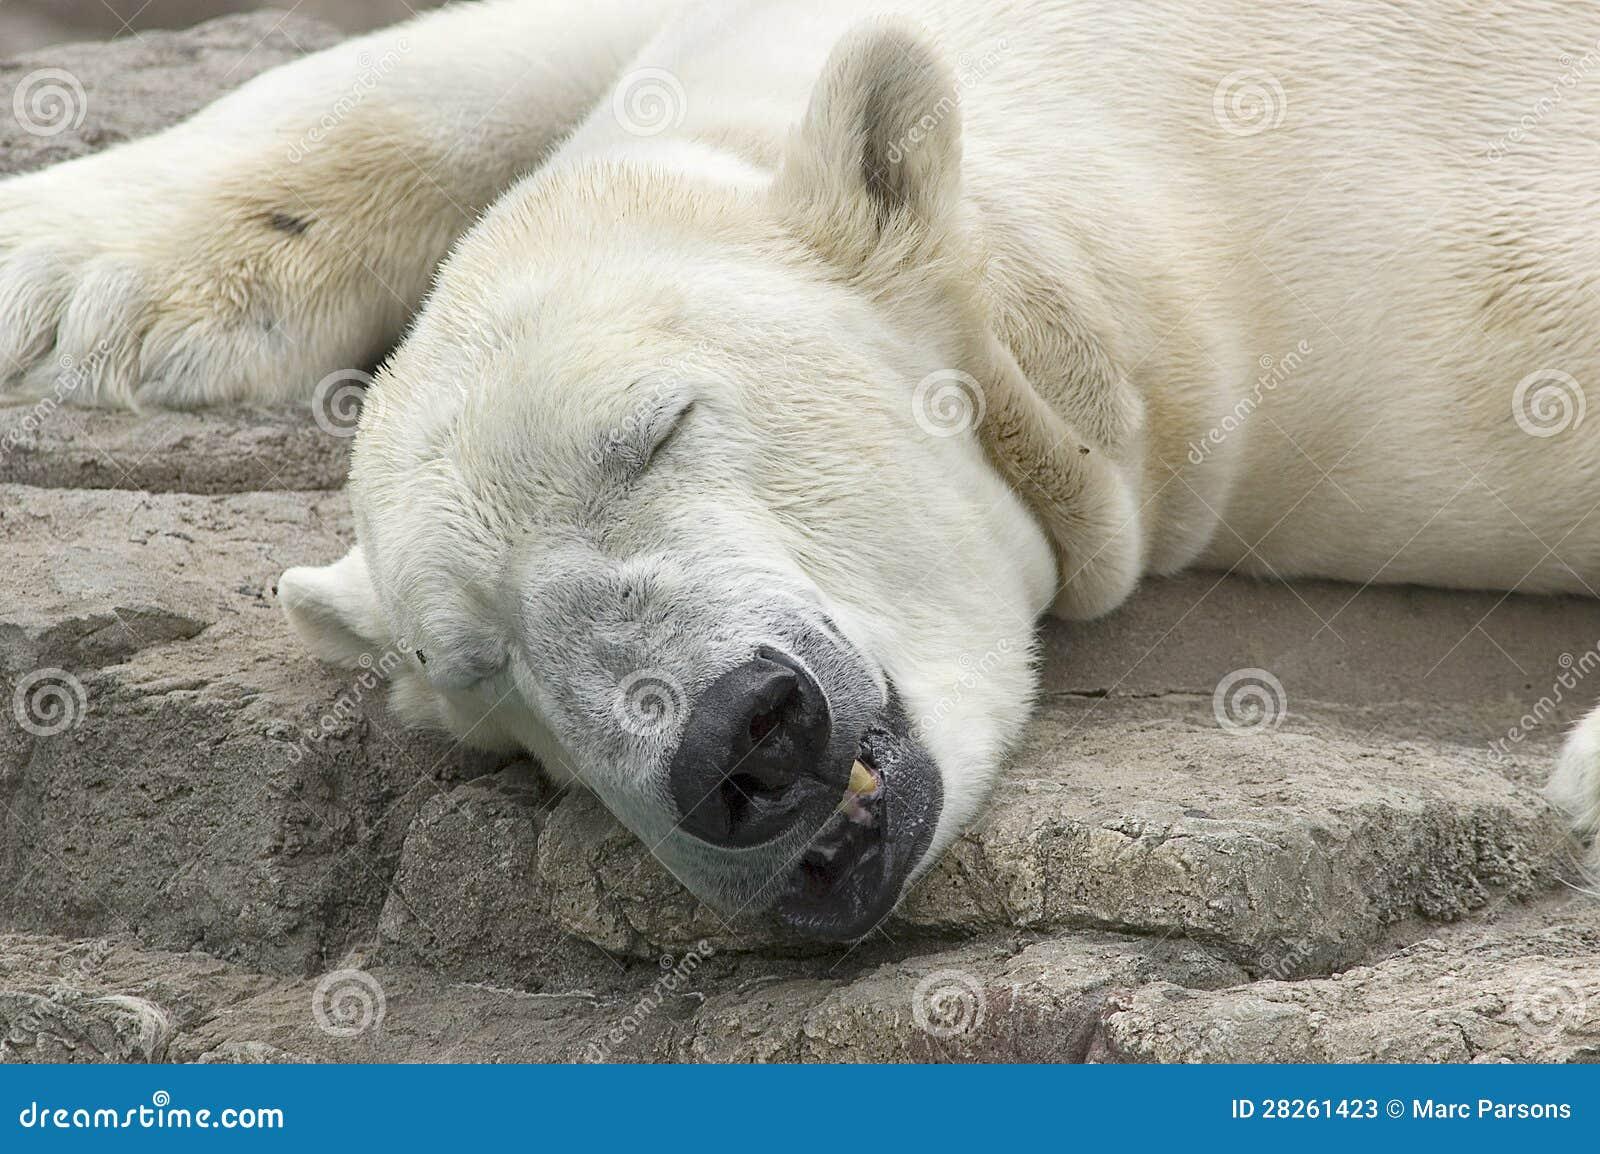 Baby polar bear sleeping - photo#24